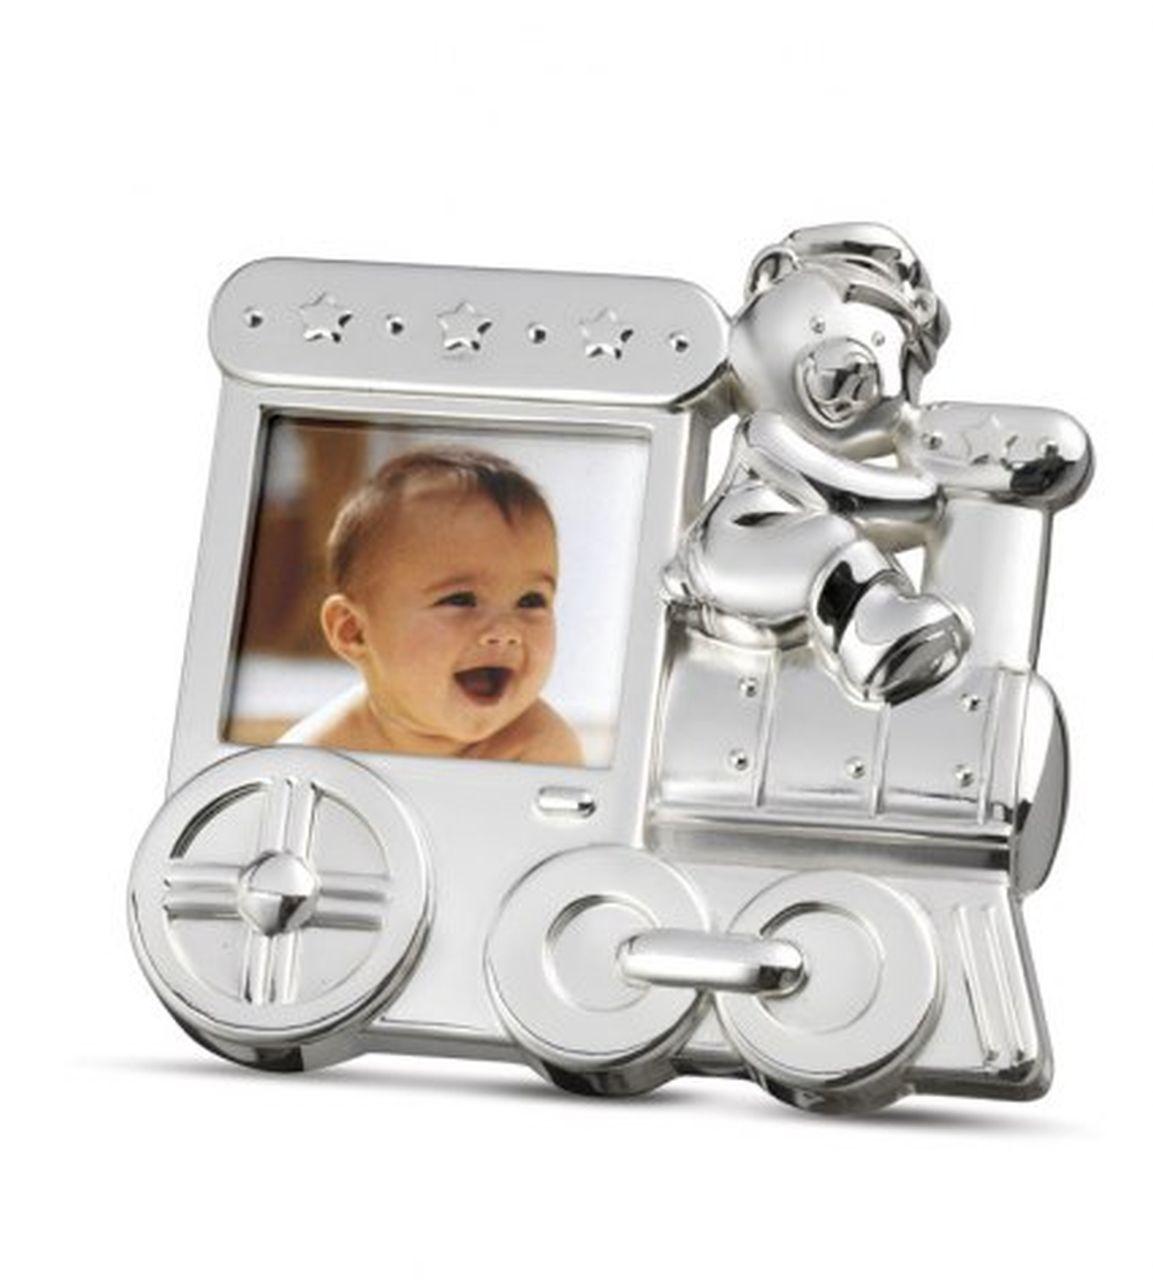 Portafoto trenino bambino bambina argentato argento cm.11x11x2h